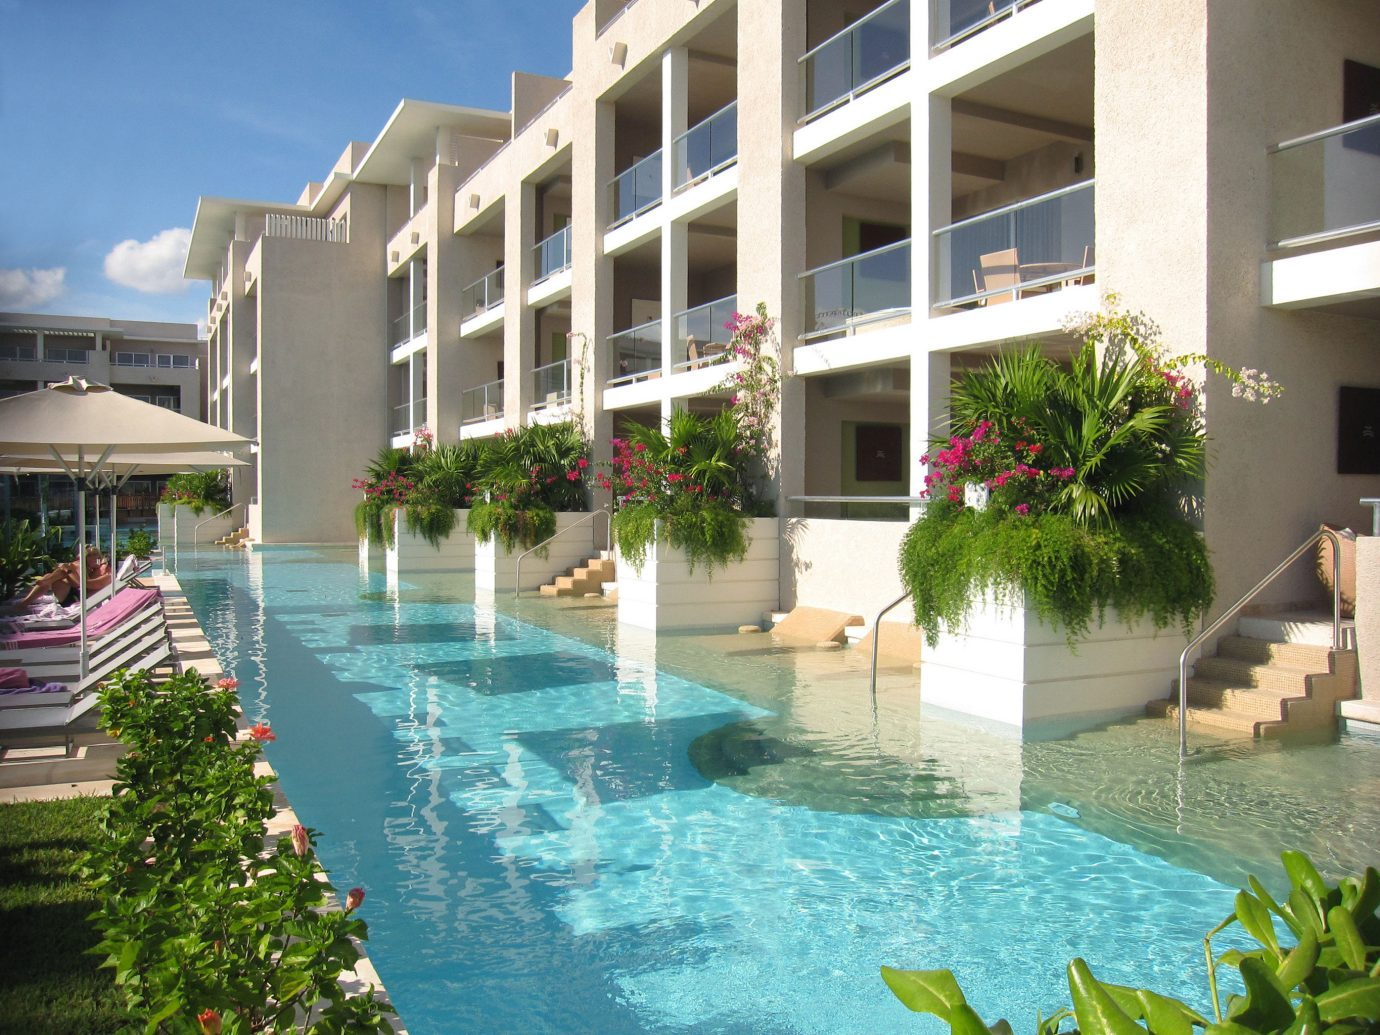 All-Inclusive Resorts Hotels building outdoor condominium property Resort swimming pool estate Villa real estate apartment mansion